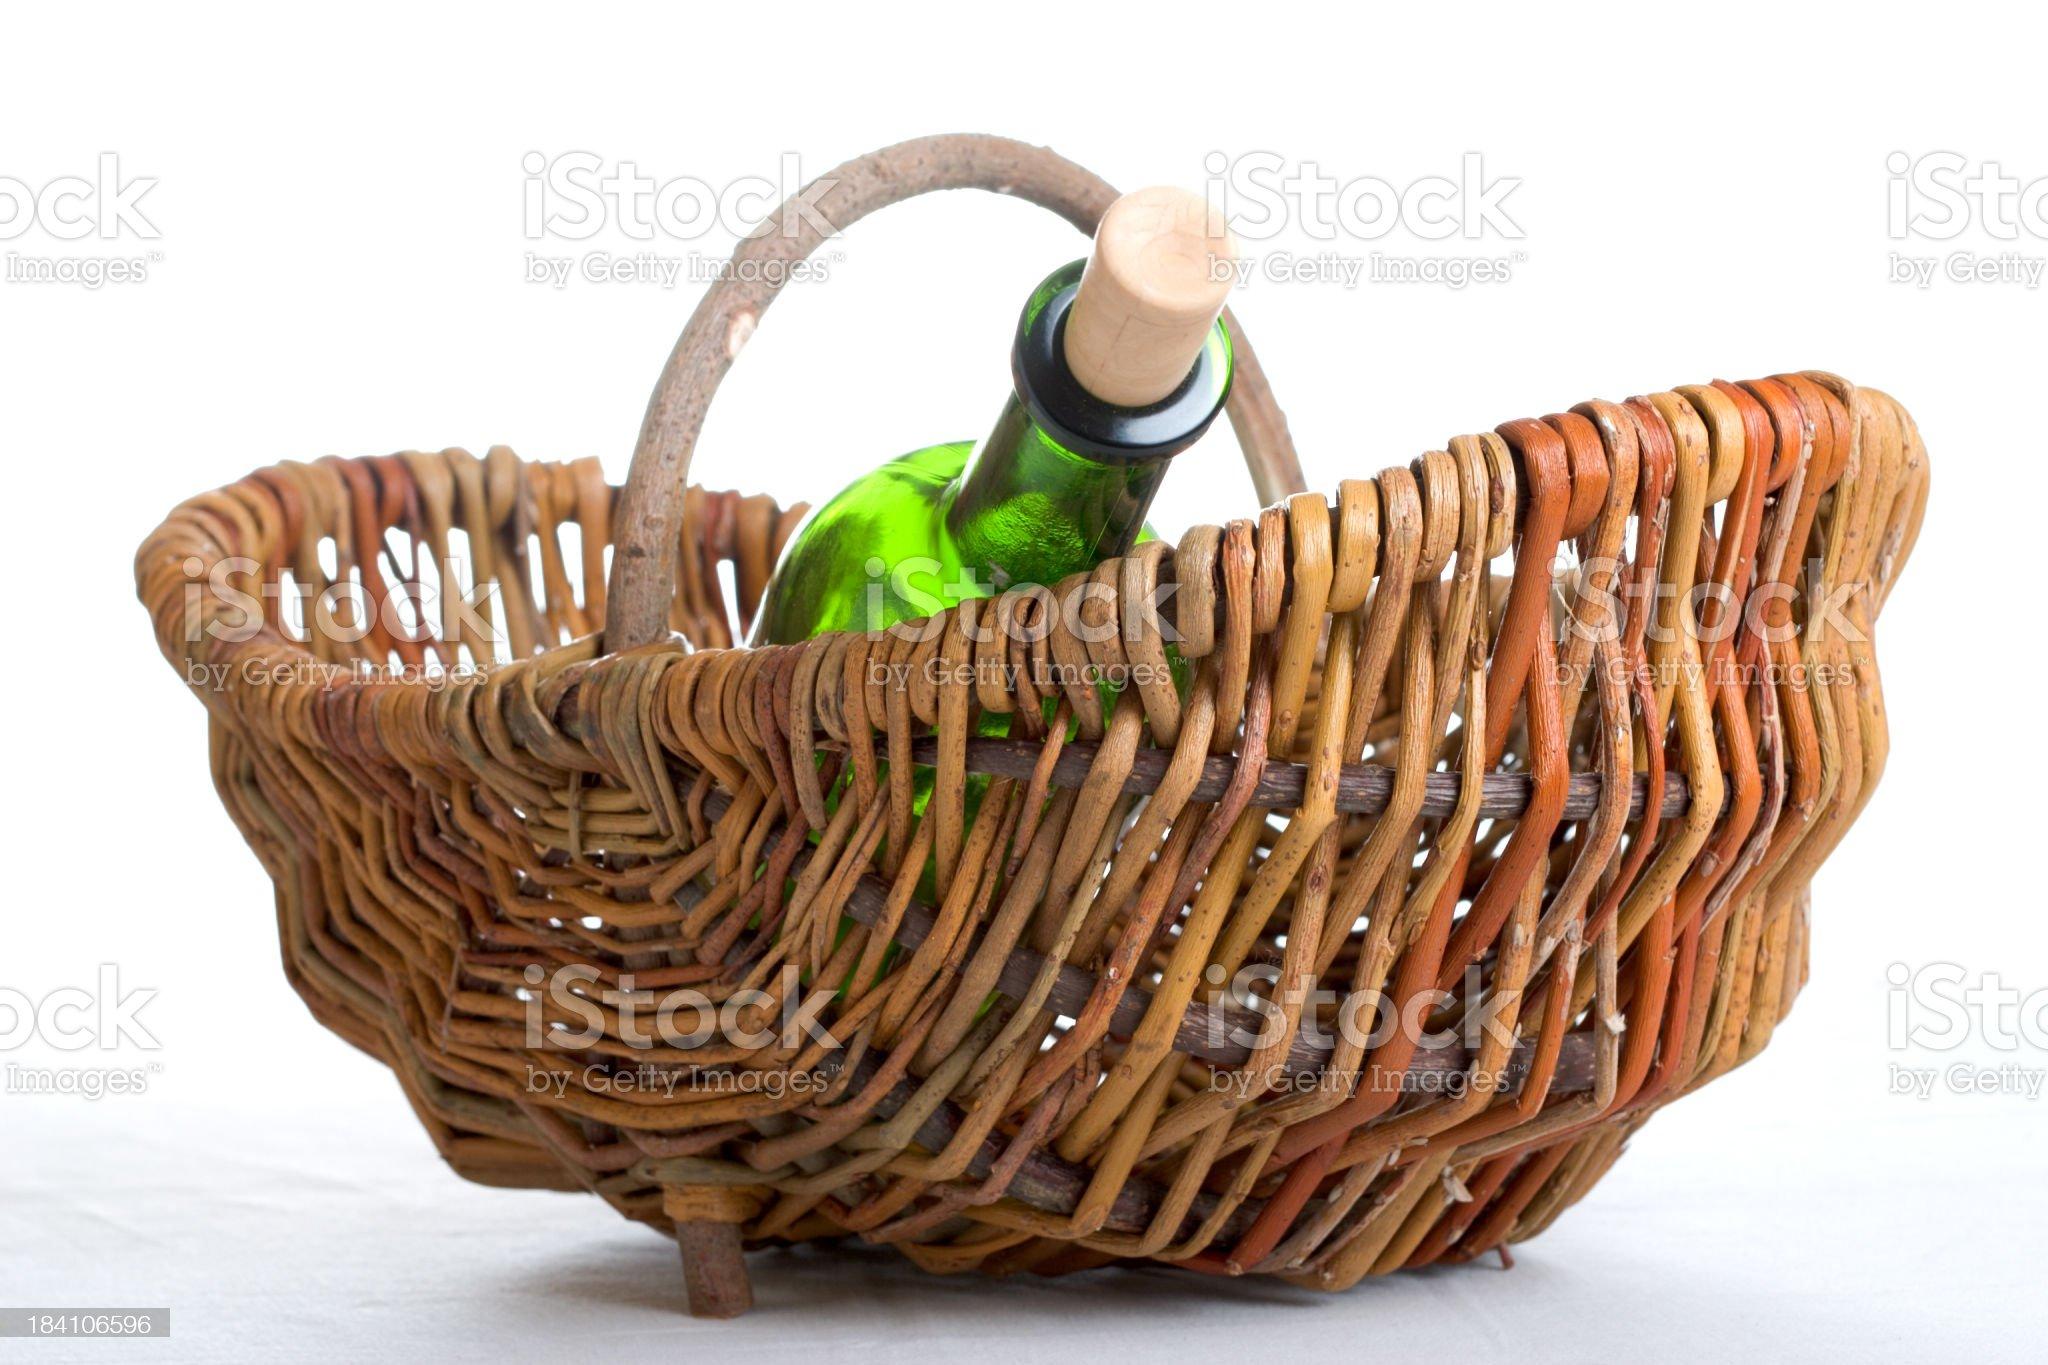 Ready to picnic royalty-free stock photo